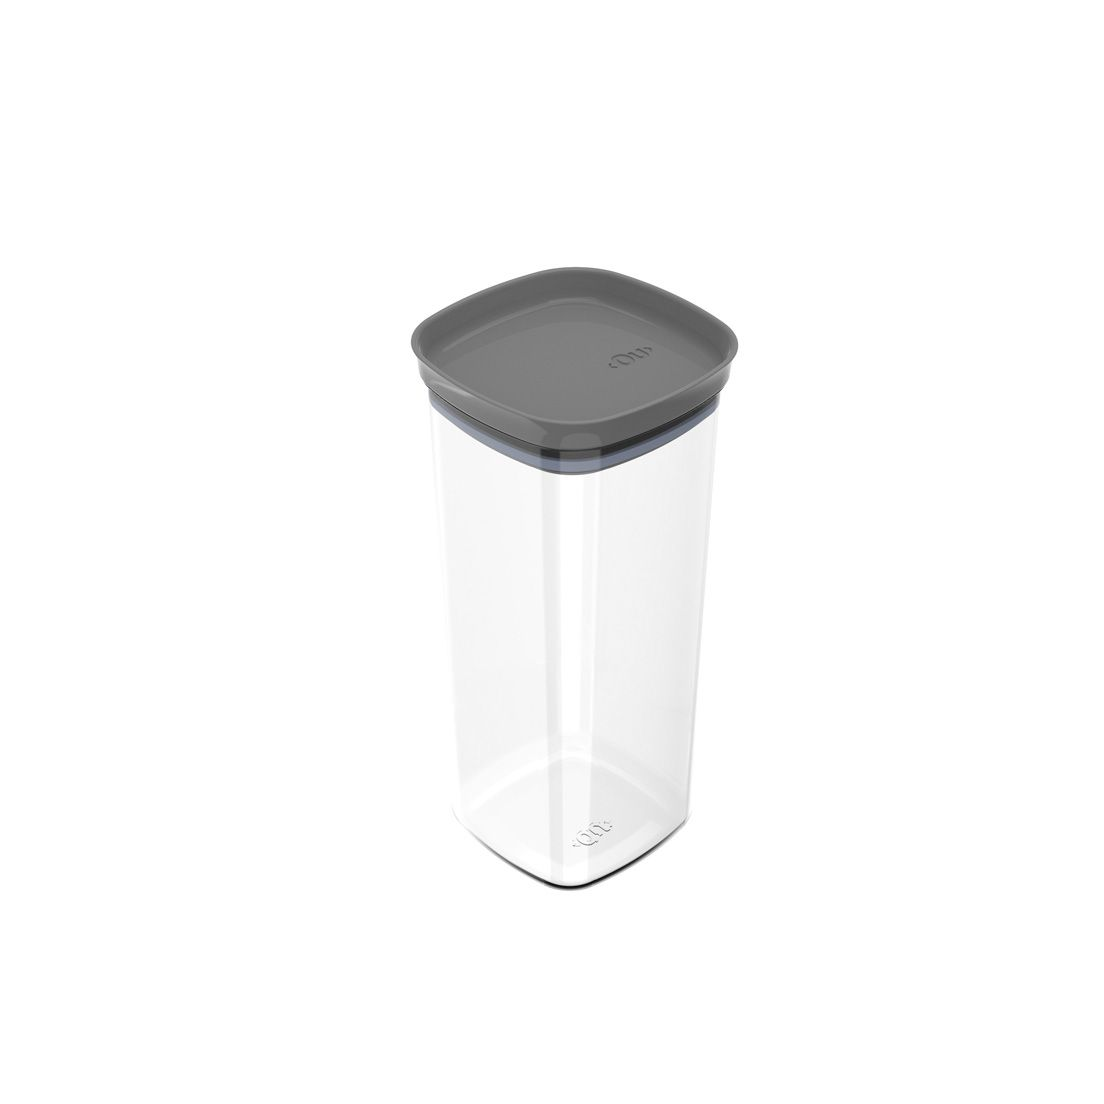 Pote de Plástico com Tampa Hermética Block 1,5L Chumbo